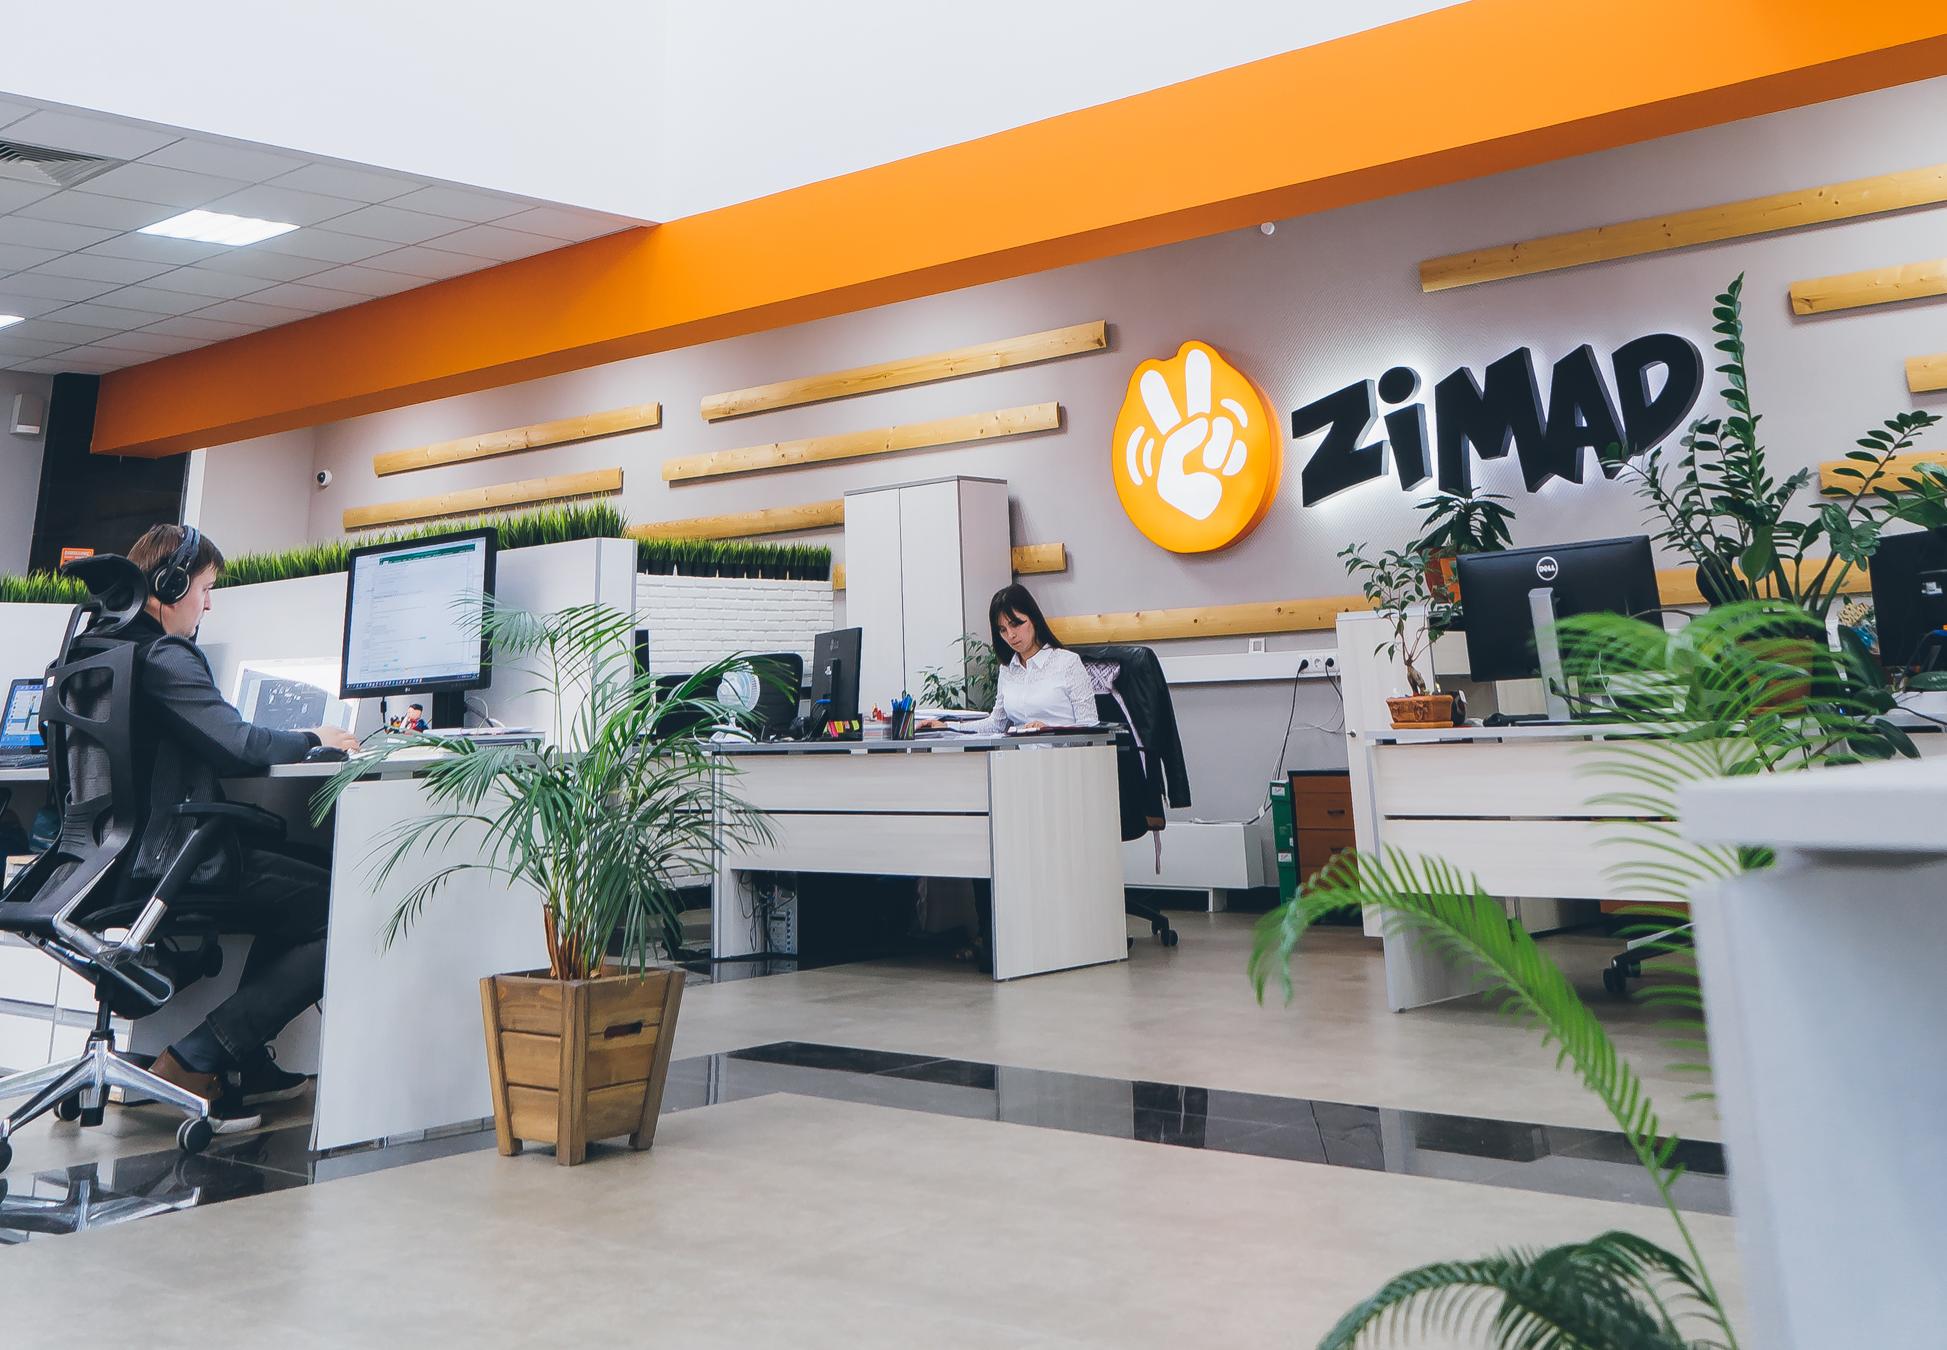 RU_Ulyanovsk_ZiMAD_office